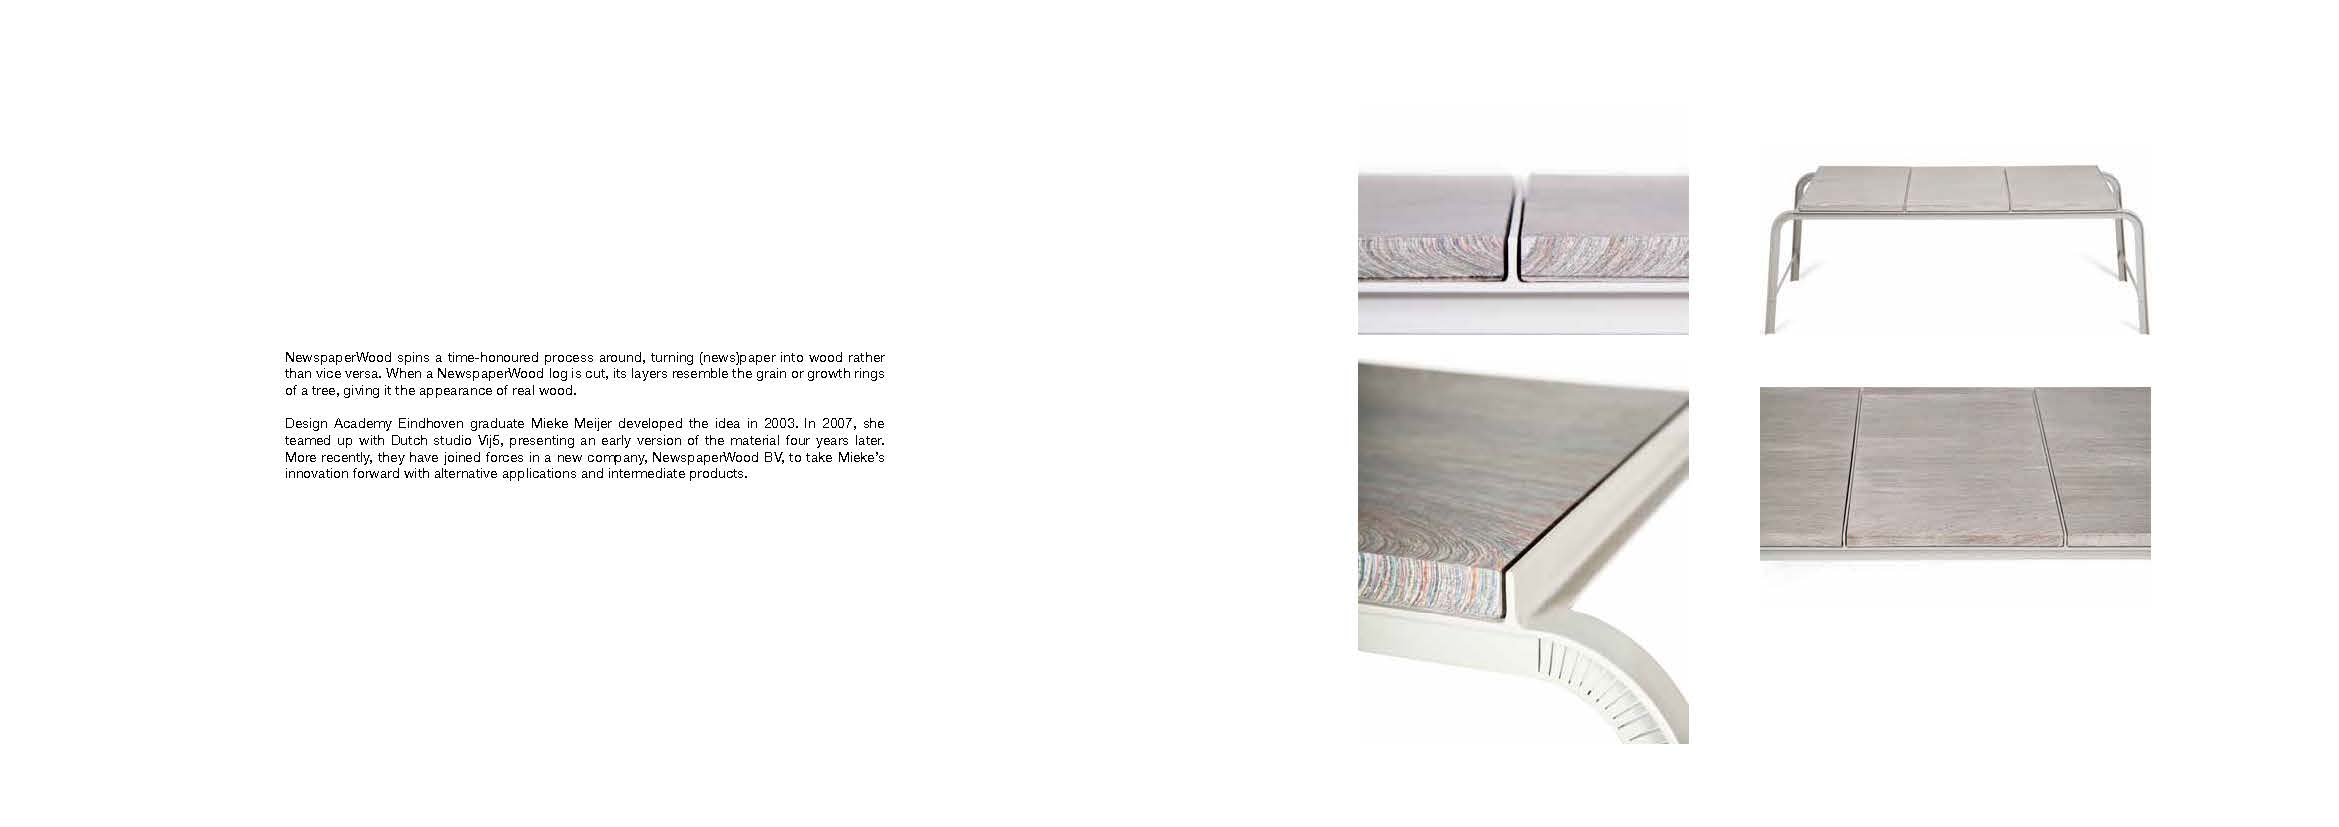 MANIFESTO MASTER FILE 221214 _Page_102.jpg